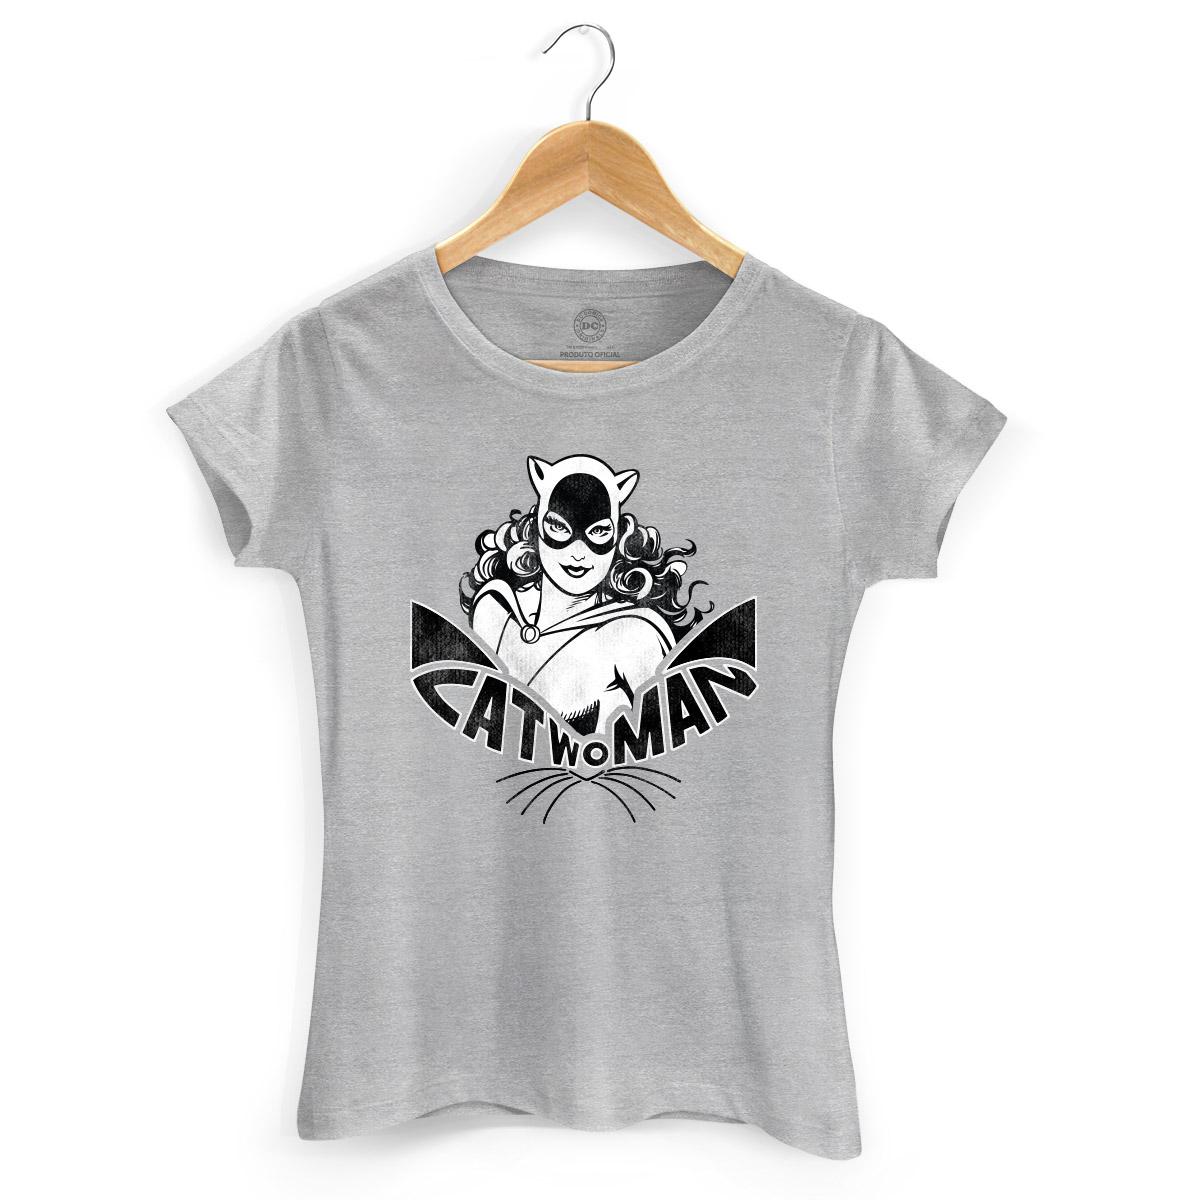 Camiseta Feminina Catwoman